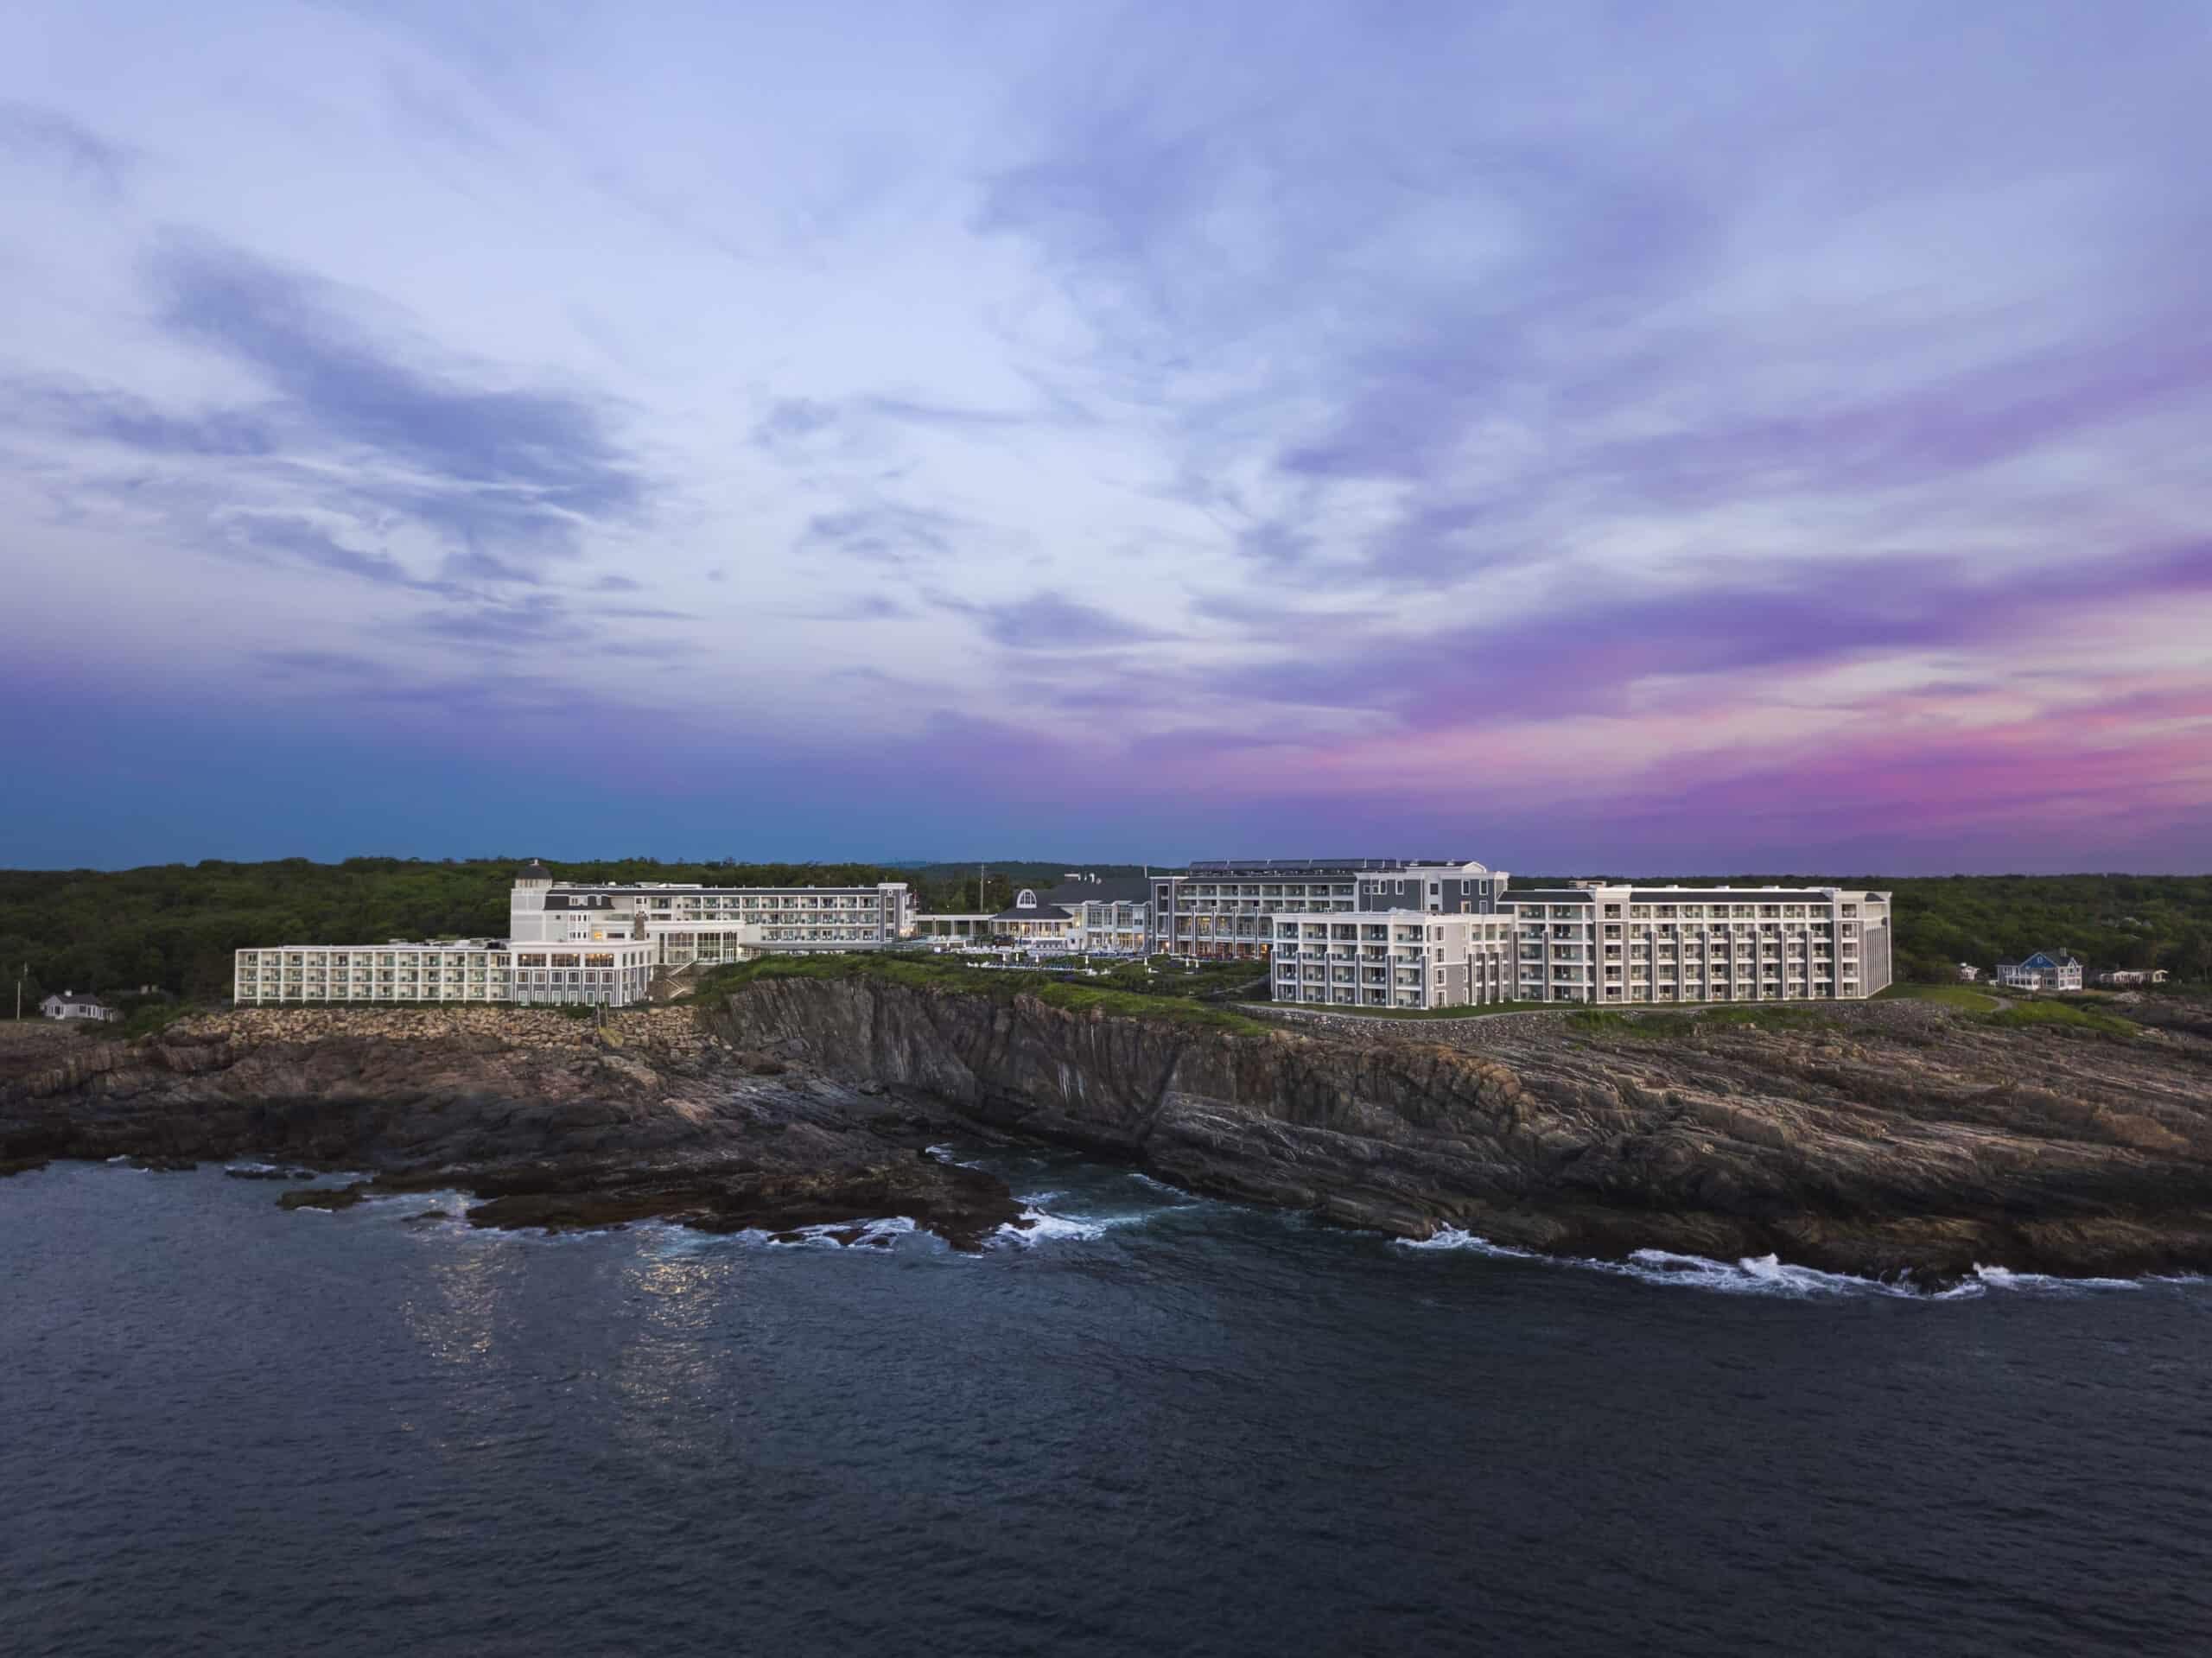 White hotel on the cliffs under a purple sunset